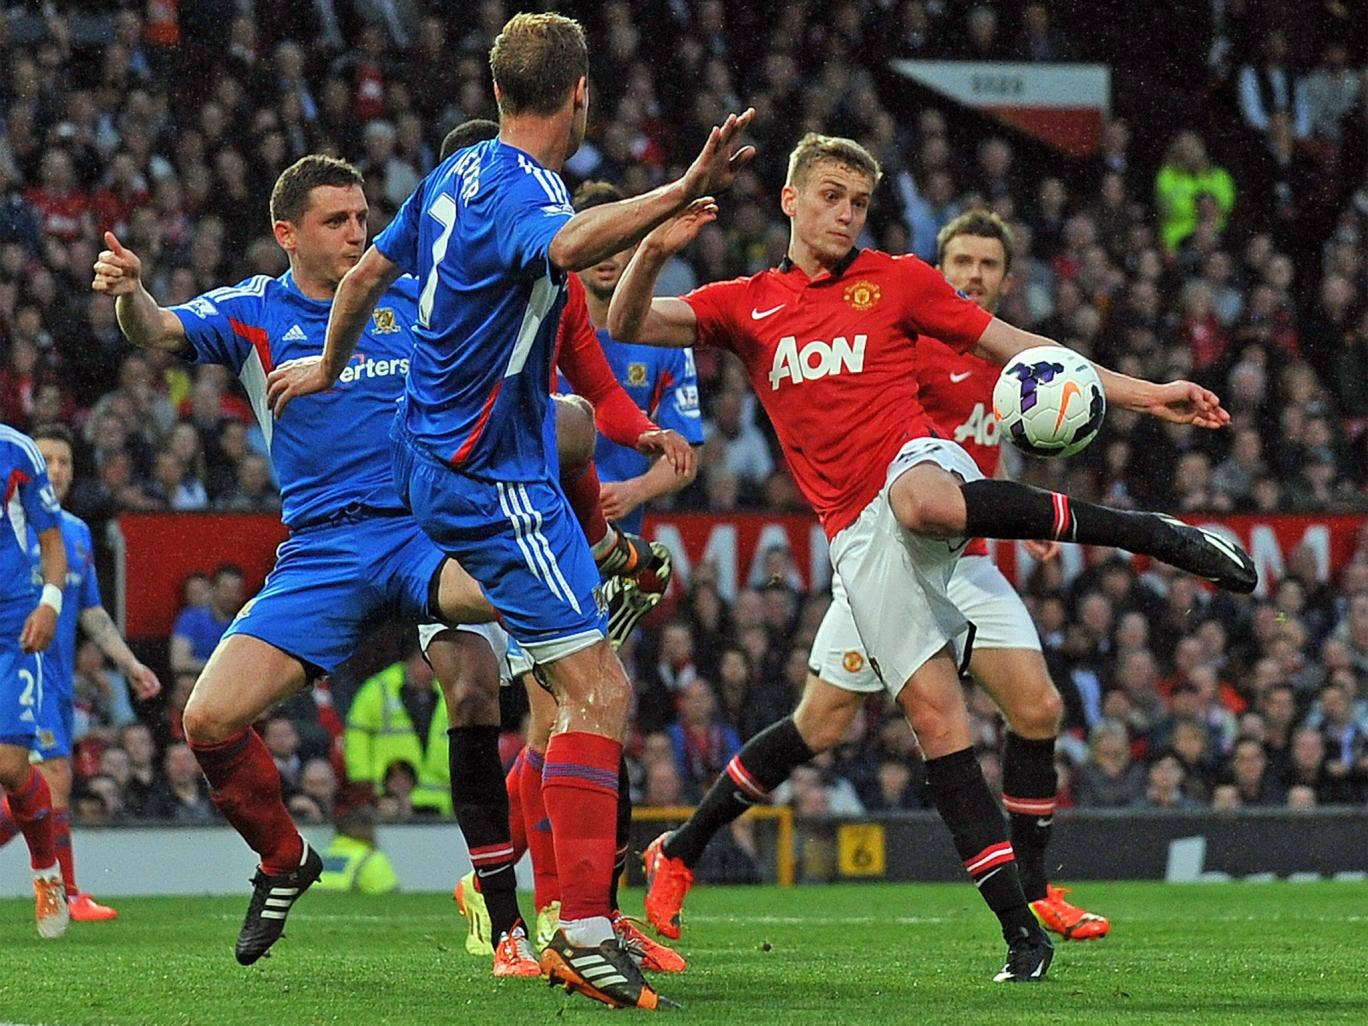 James Wilson displayed predatory instinct to give United the lead